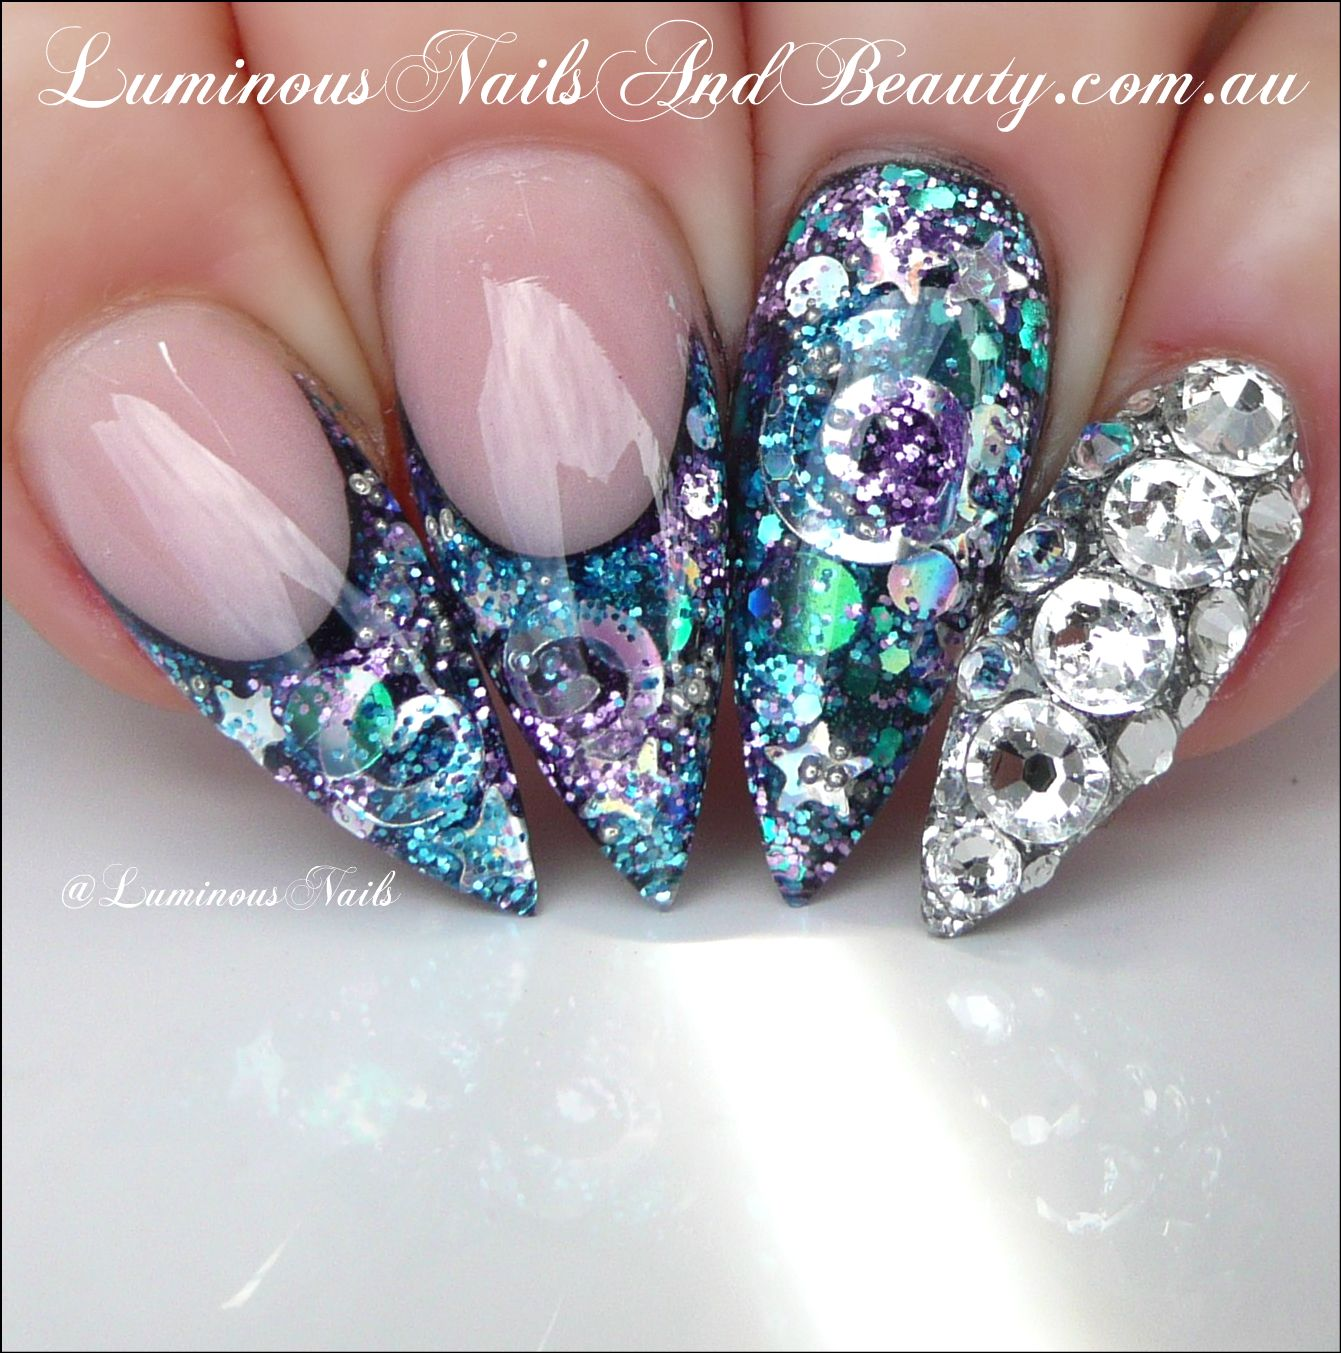 Luminous Nails: Galaxy Acrylic Nails... Available in Luminous Nails ...